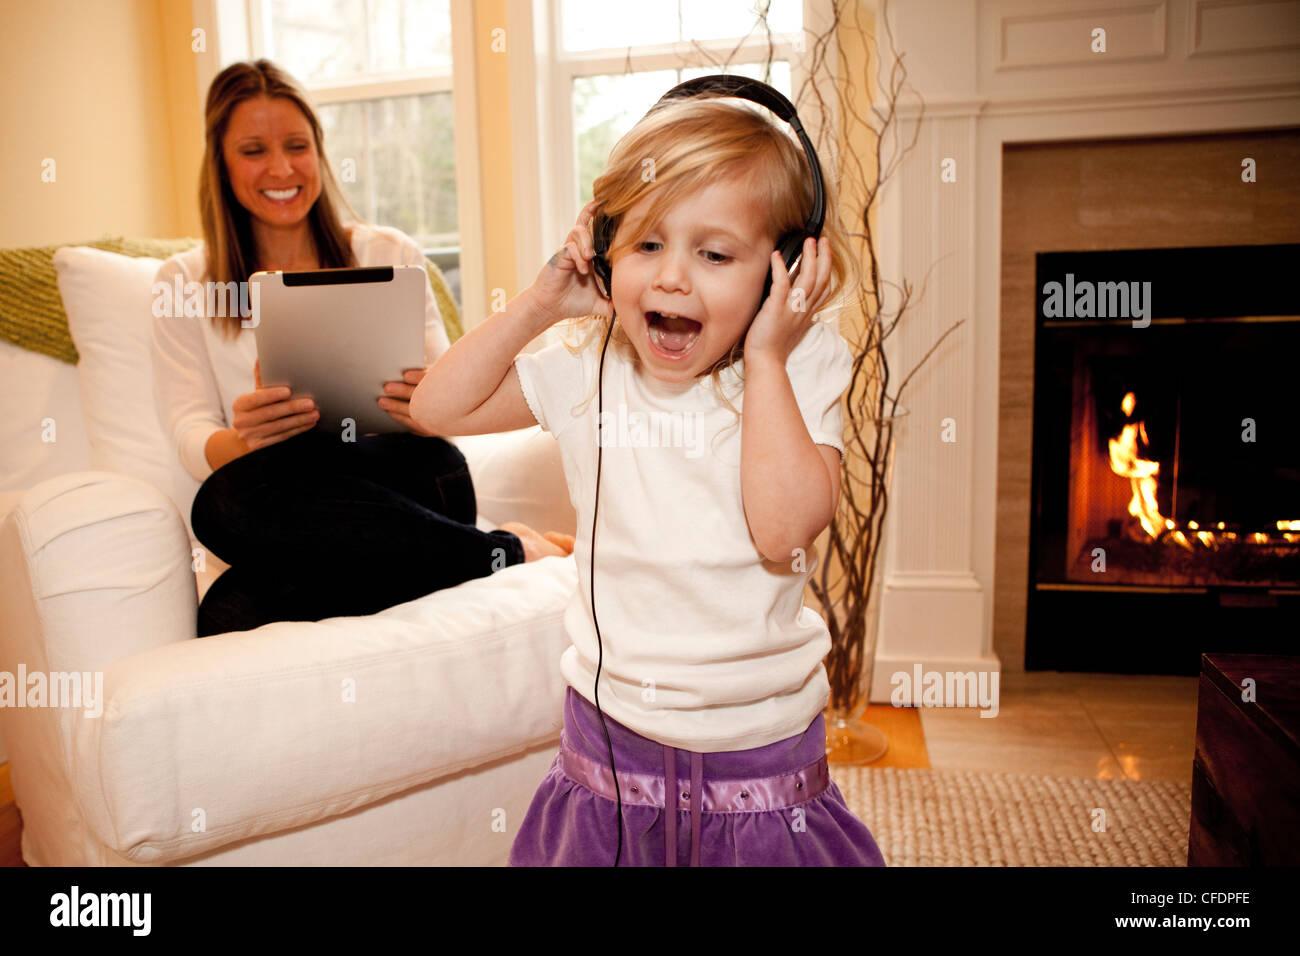 3 year old girl singing. - Stock Image